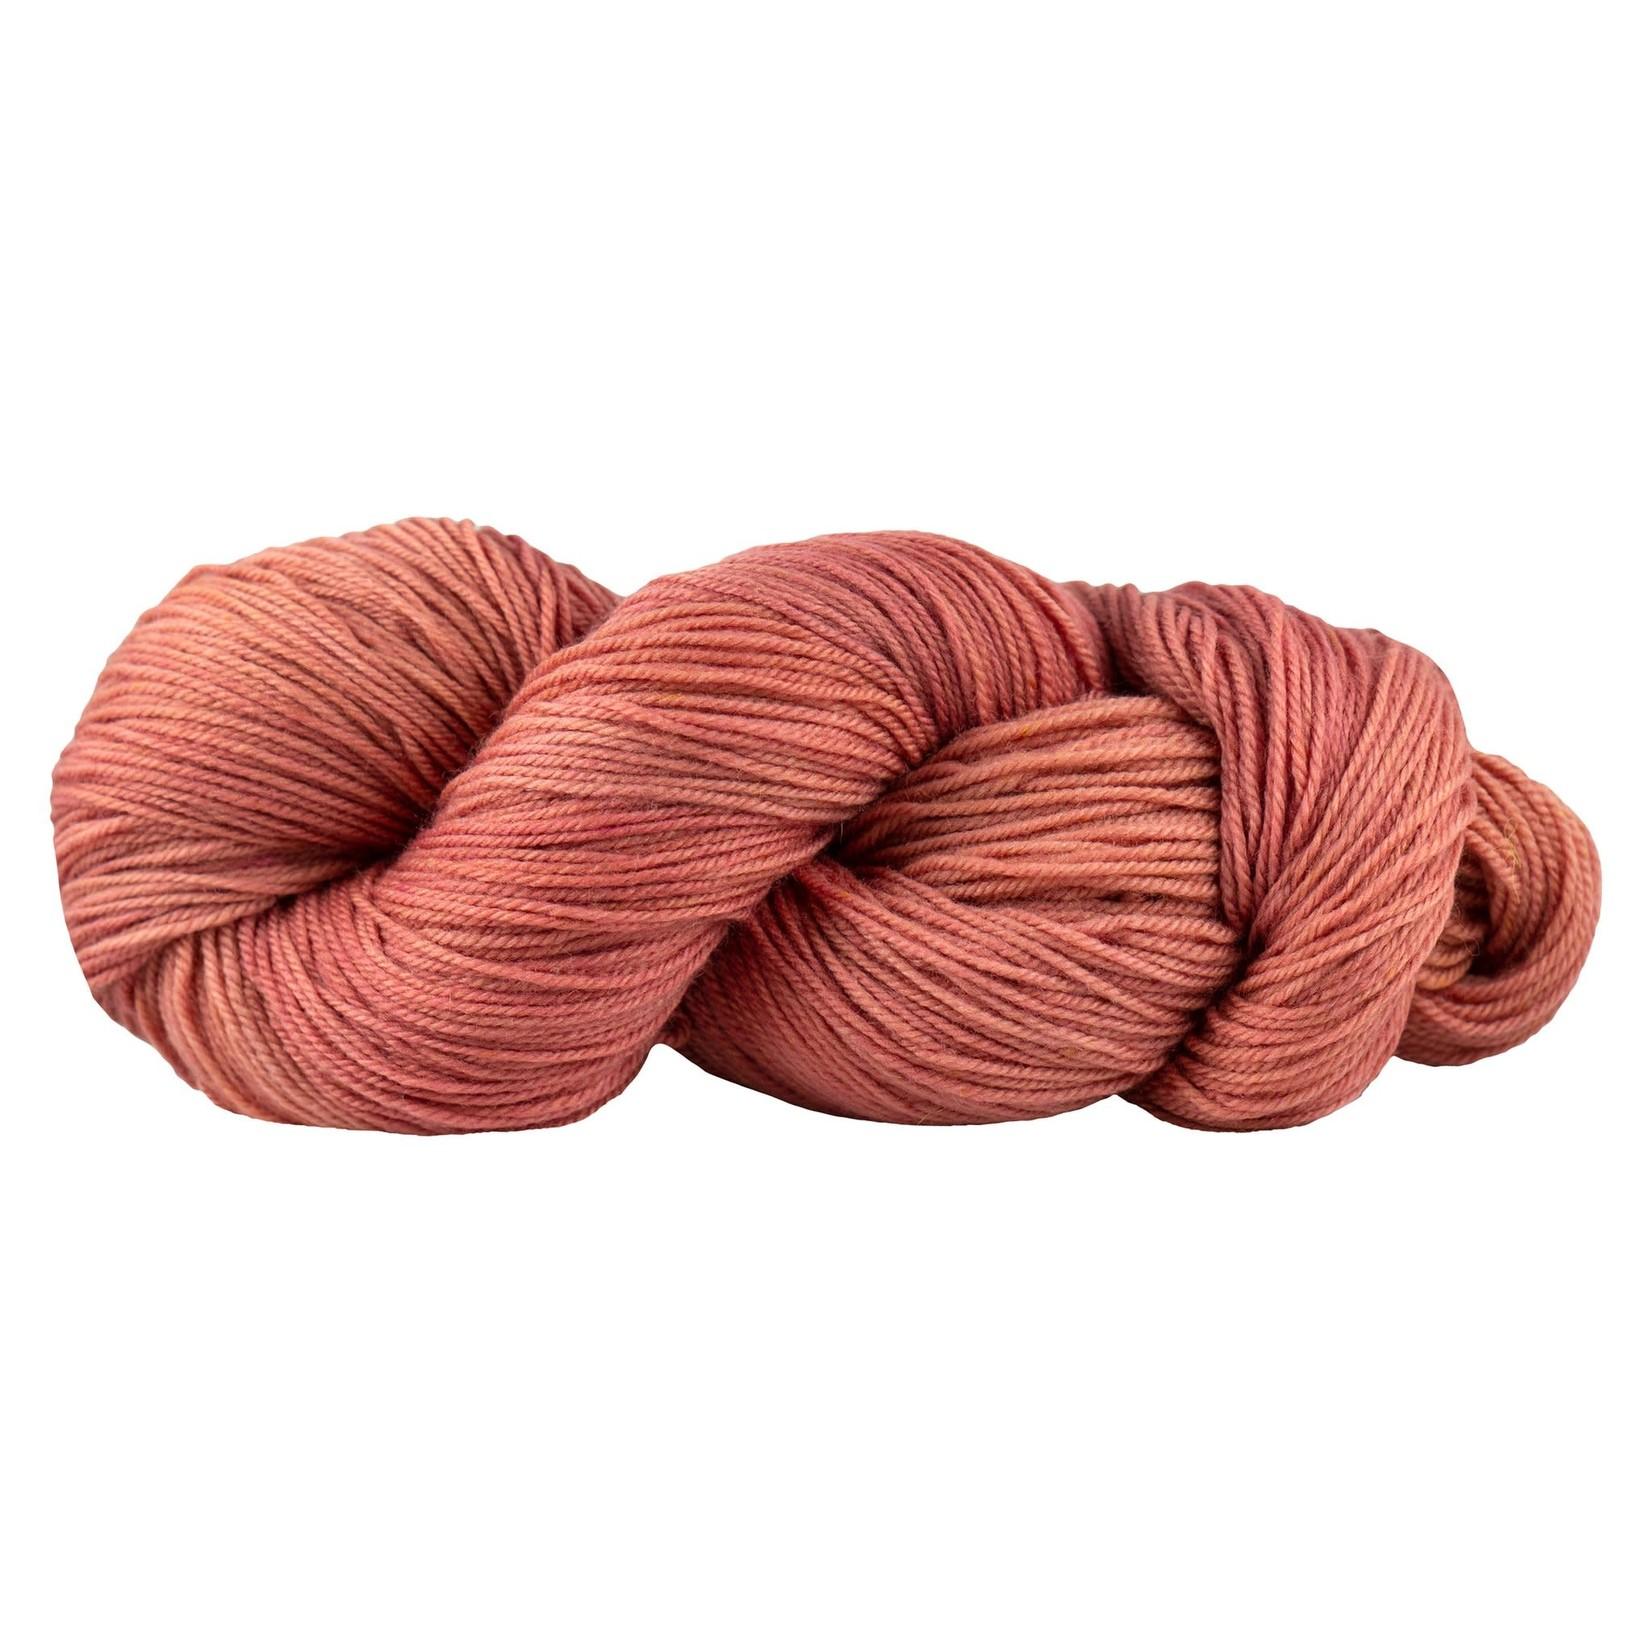 Fairmount Fibers Alegria, A2127, Copper